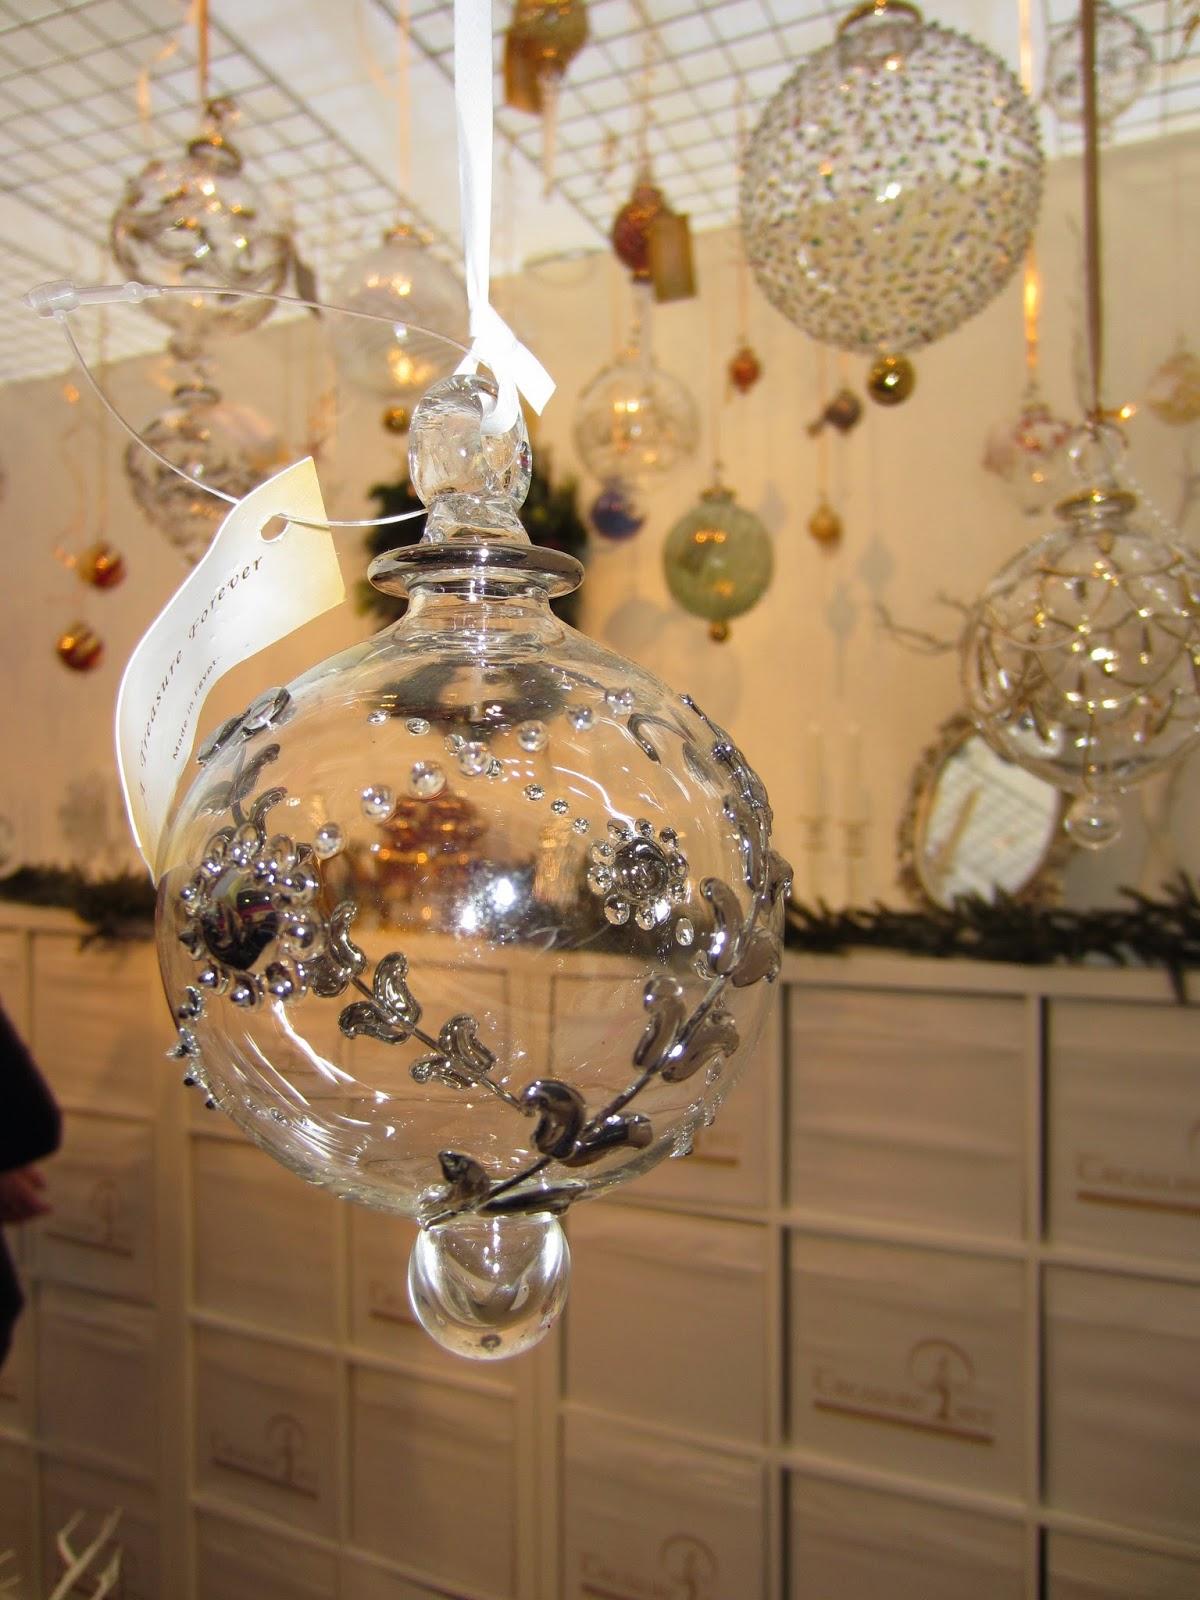 Glass xmas decorations